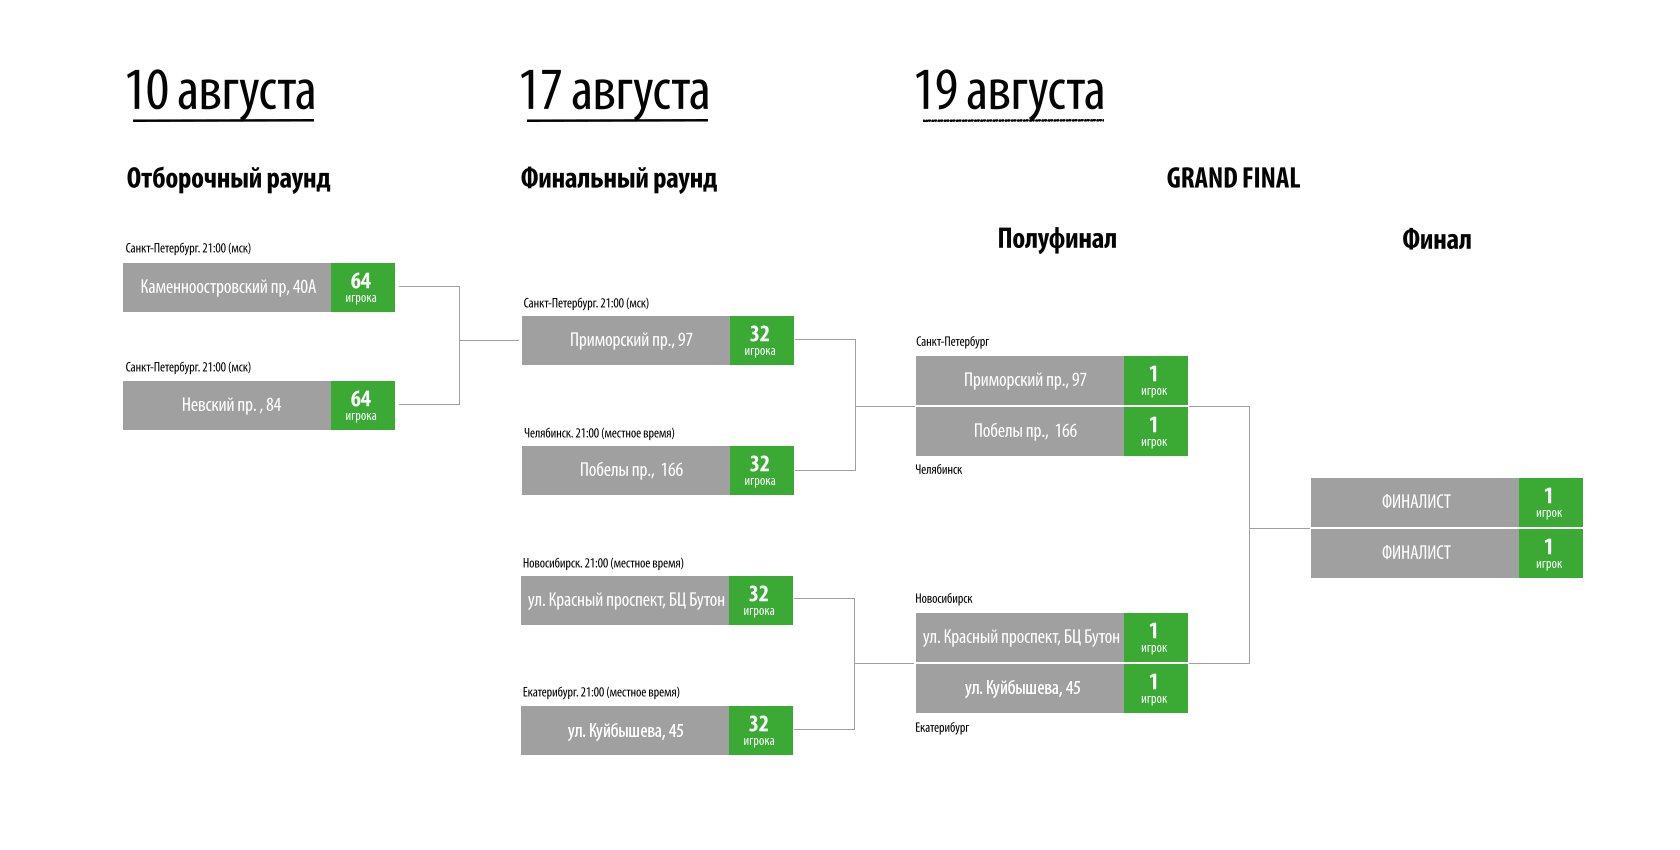 Регламент турнира по фифа - agenliga.ru